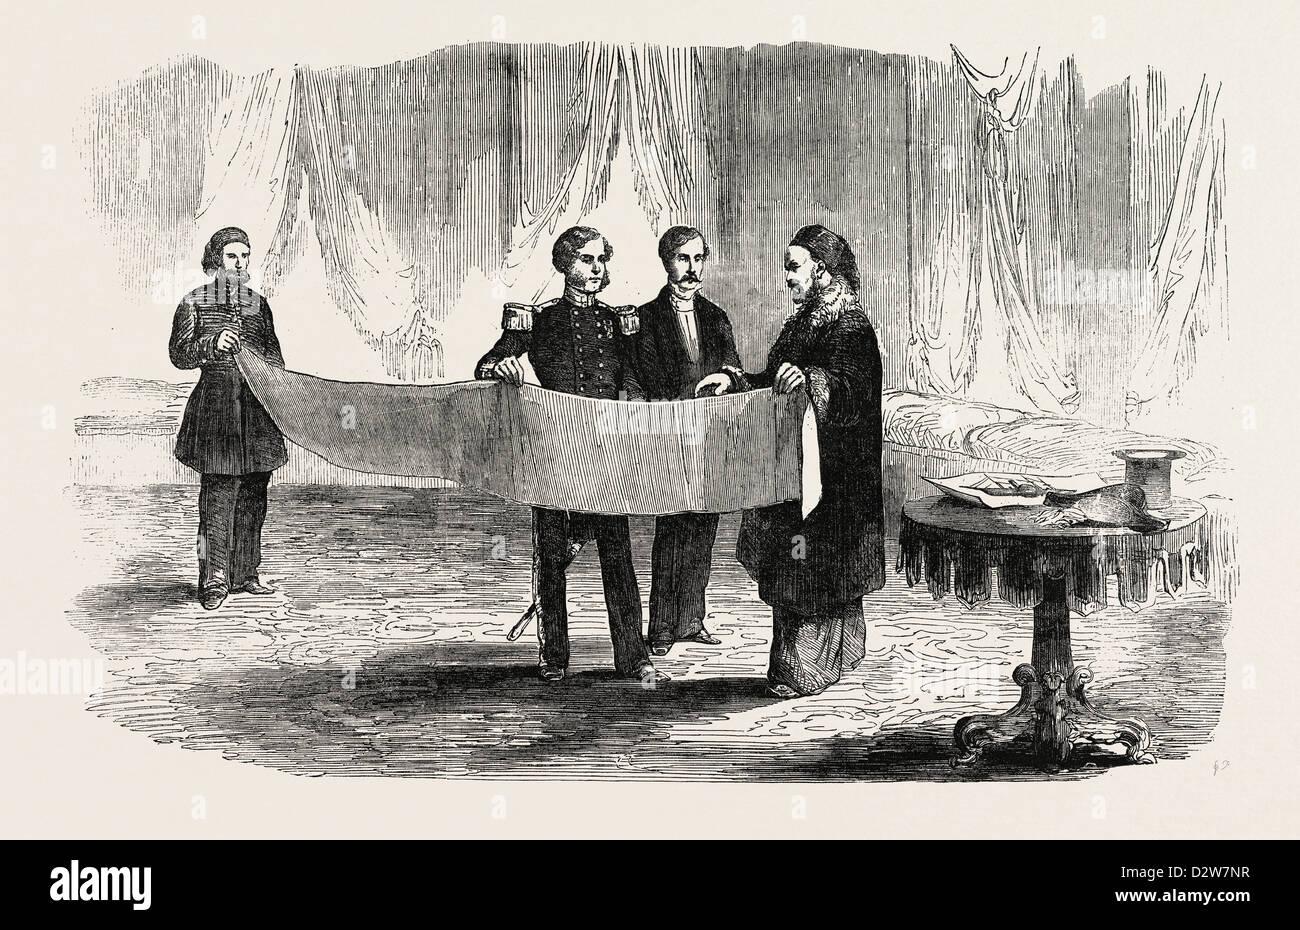 THE CRIMEAN WAR: LIEUTENANT MONTAGU O'REILLY EXPLAINING HIS SKETCH OF SEBASTOPOL TO THE SULTAN 1854 - Stock Image